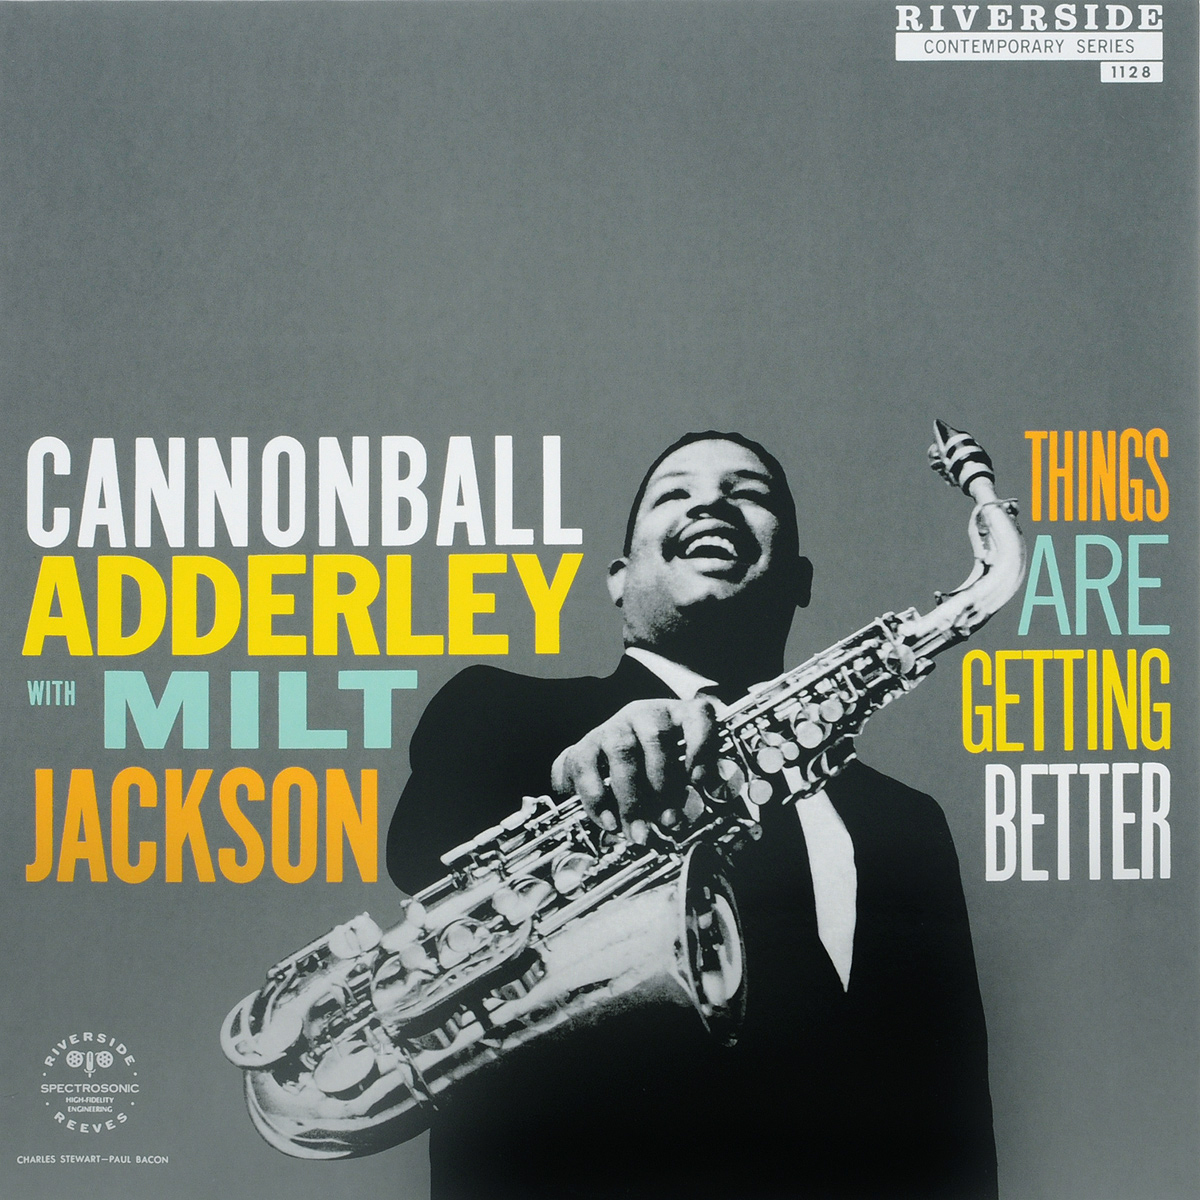 Кэннонболл Эдерли,Милт Джексон Cannonball Adderley With Milt Jackson. Things Are Getting Better (LP) кэннонболл эдерли милтон джексон cannonball adderley